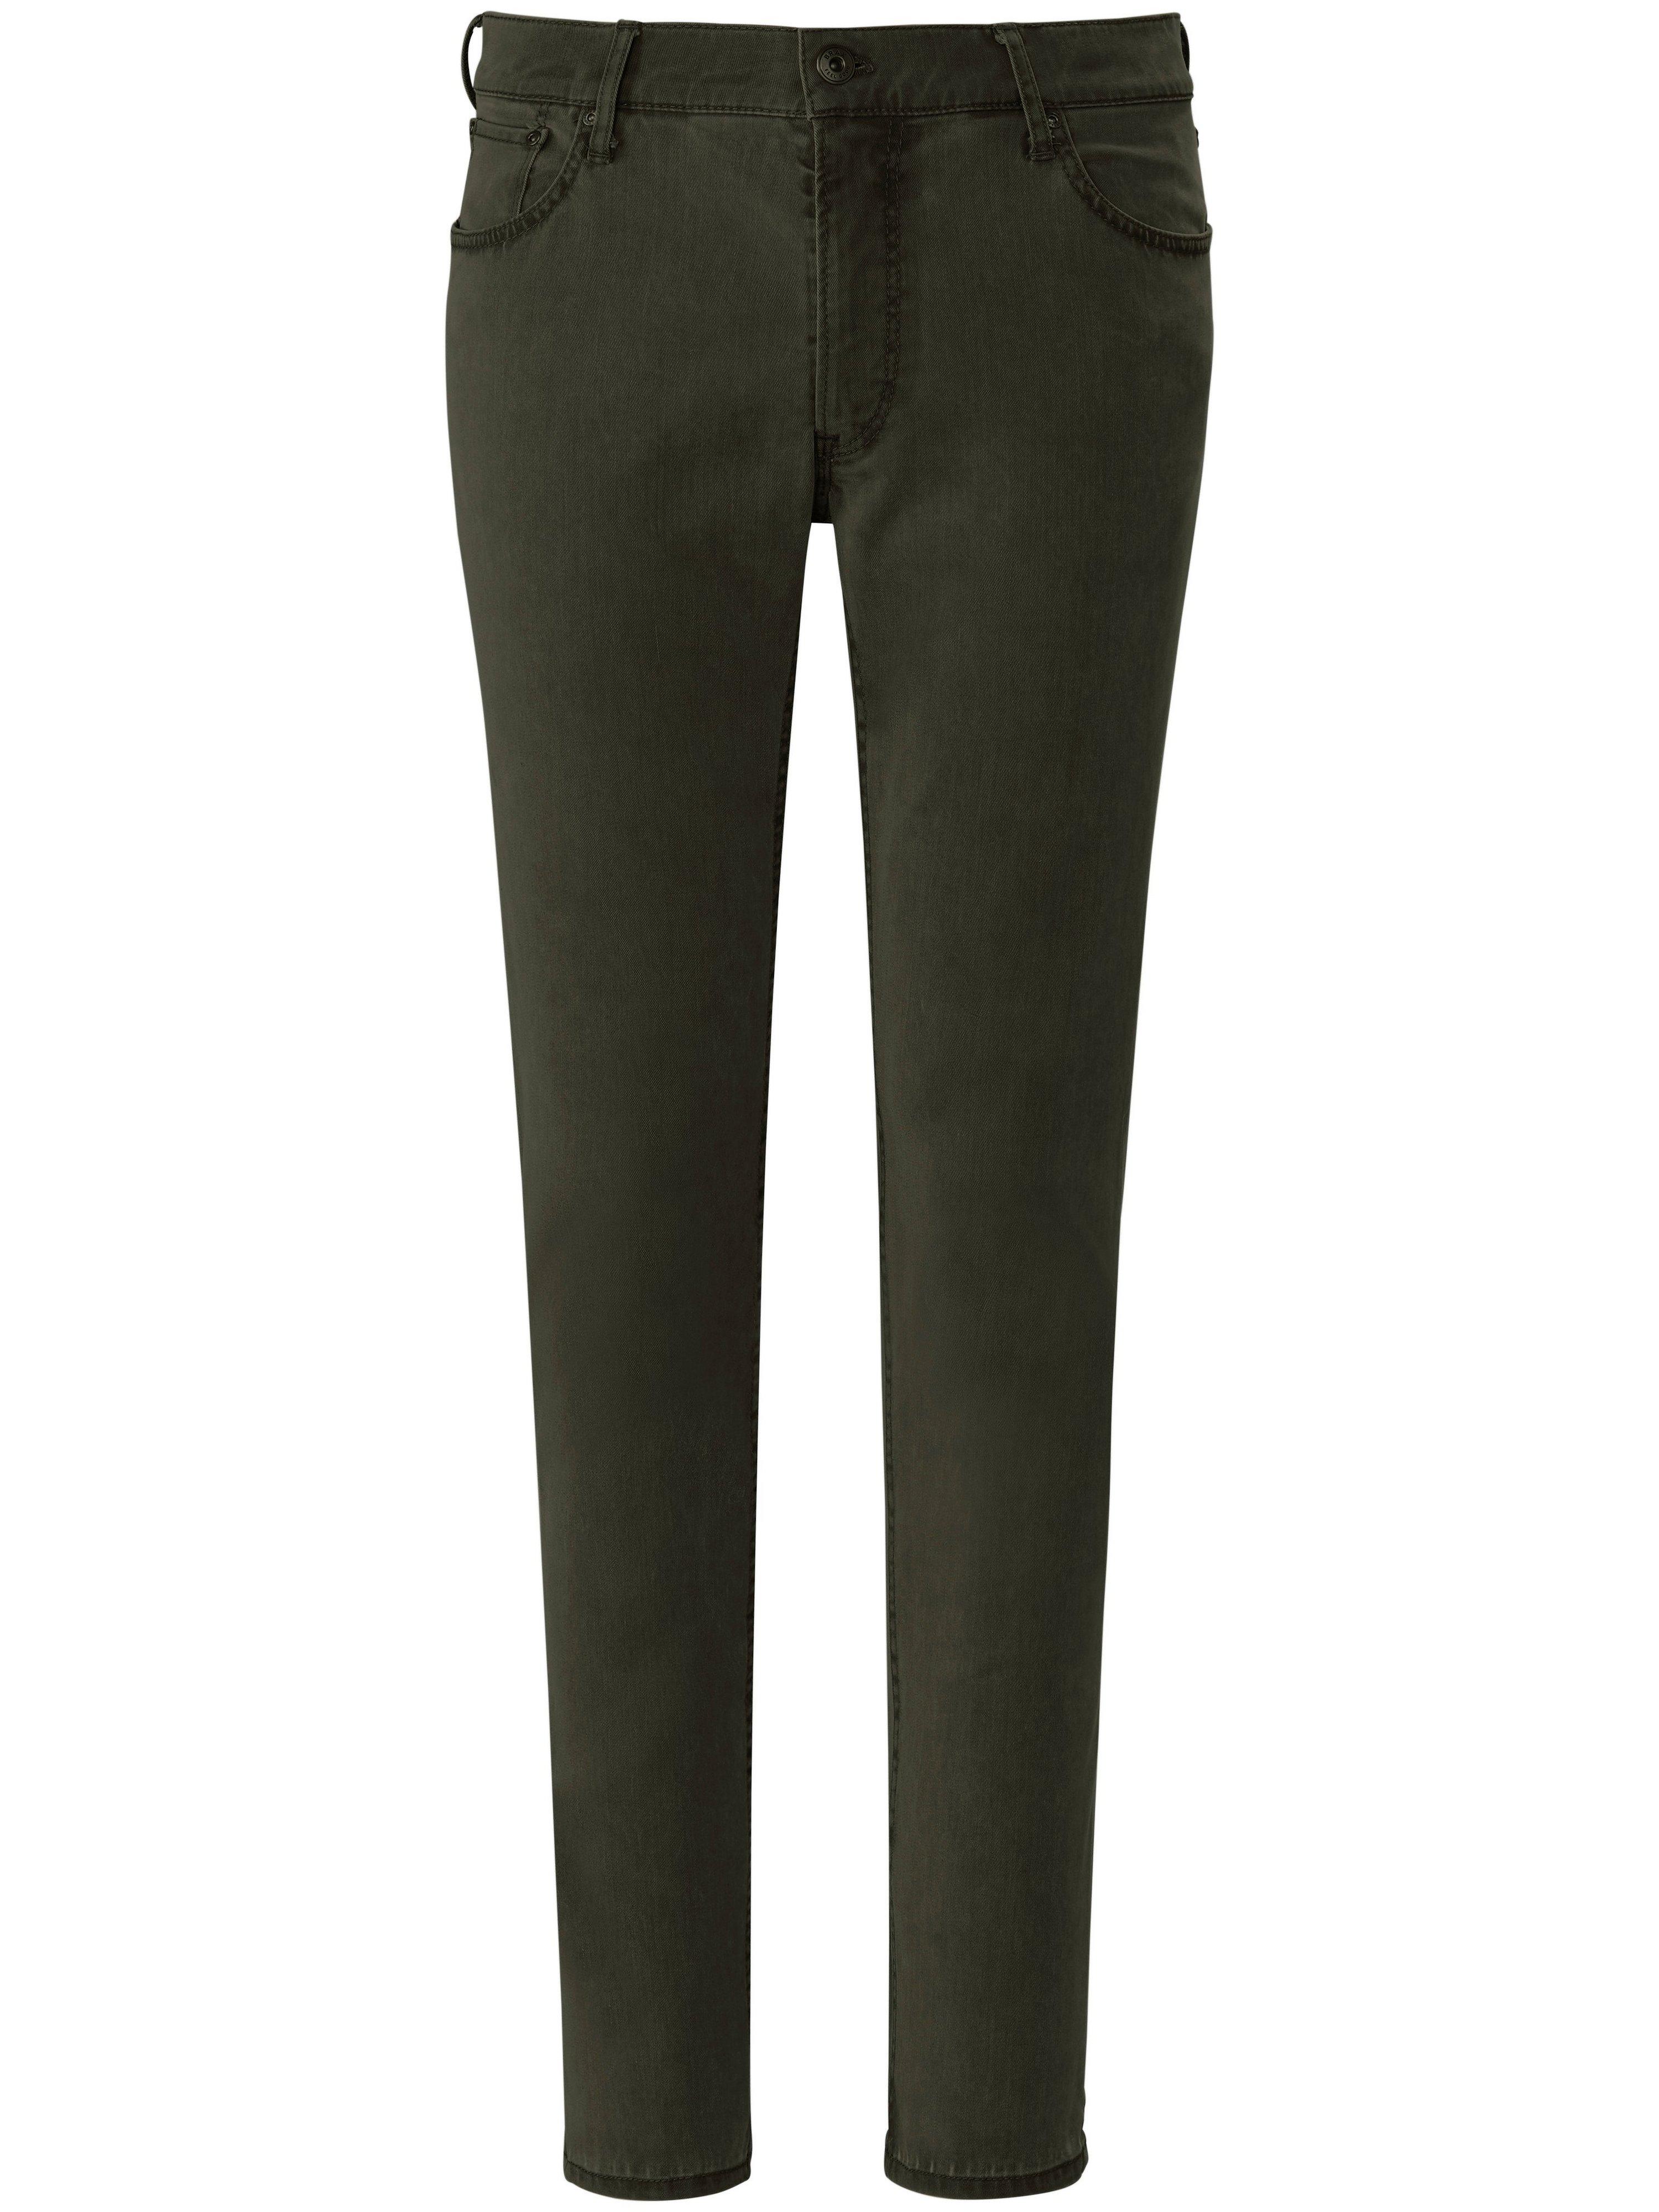 Jeans model Cadiz High-Flex-denim Van Brax Feel Good groen